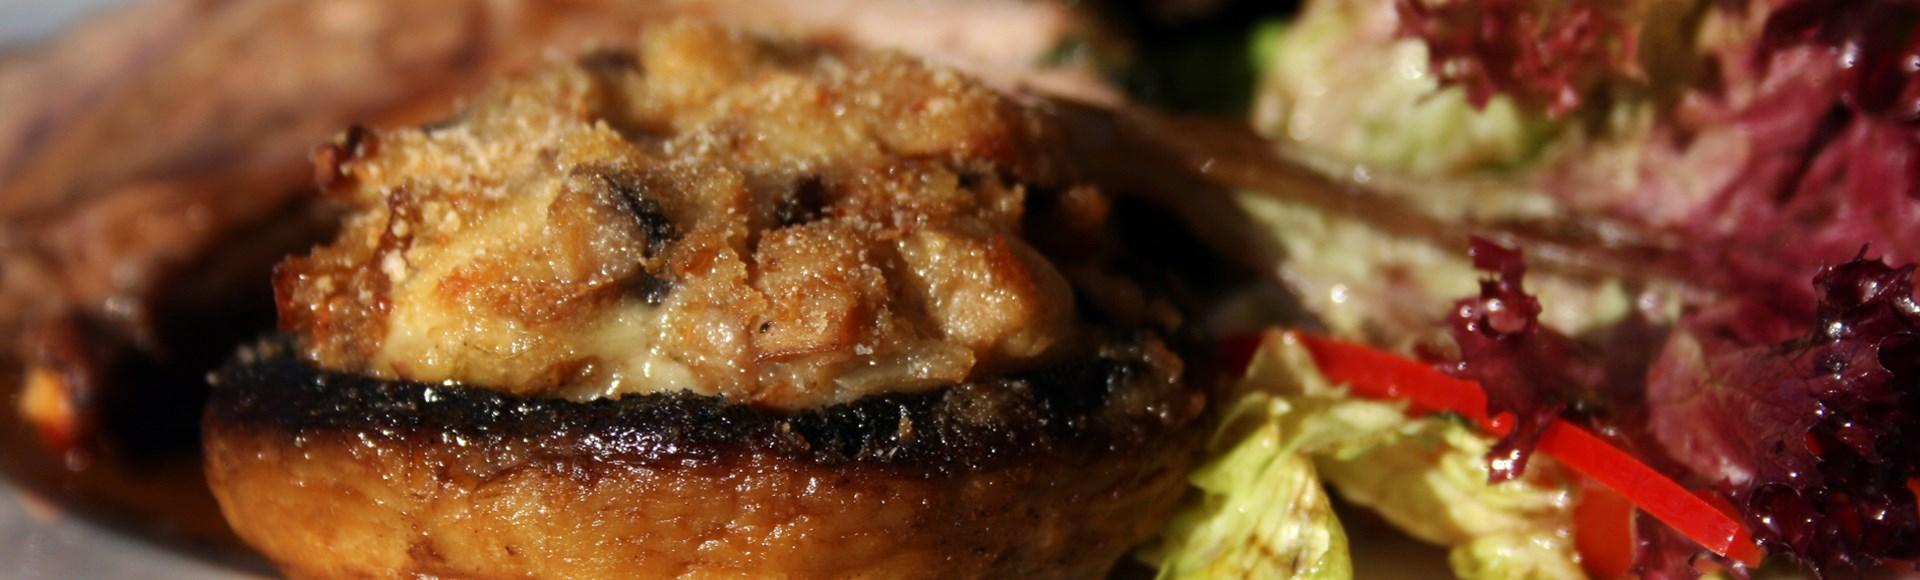 antonis-stavros-chania-crete-greece-23 - Chef Antonis & Stavros - Chania, Kreta, Hellas - Alargo | Håndplukkede ferieboliger på Kreta, Korfu og Paros